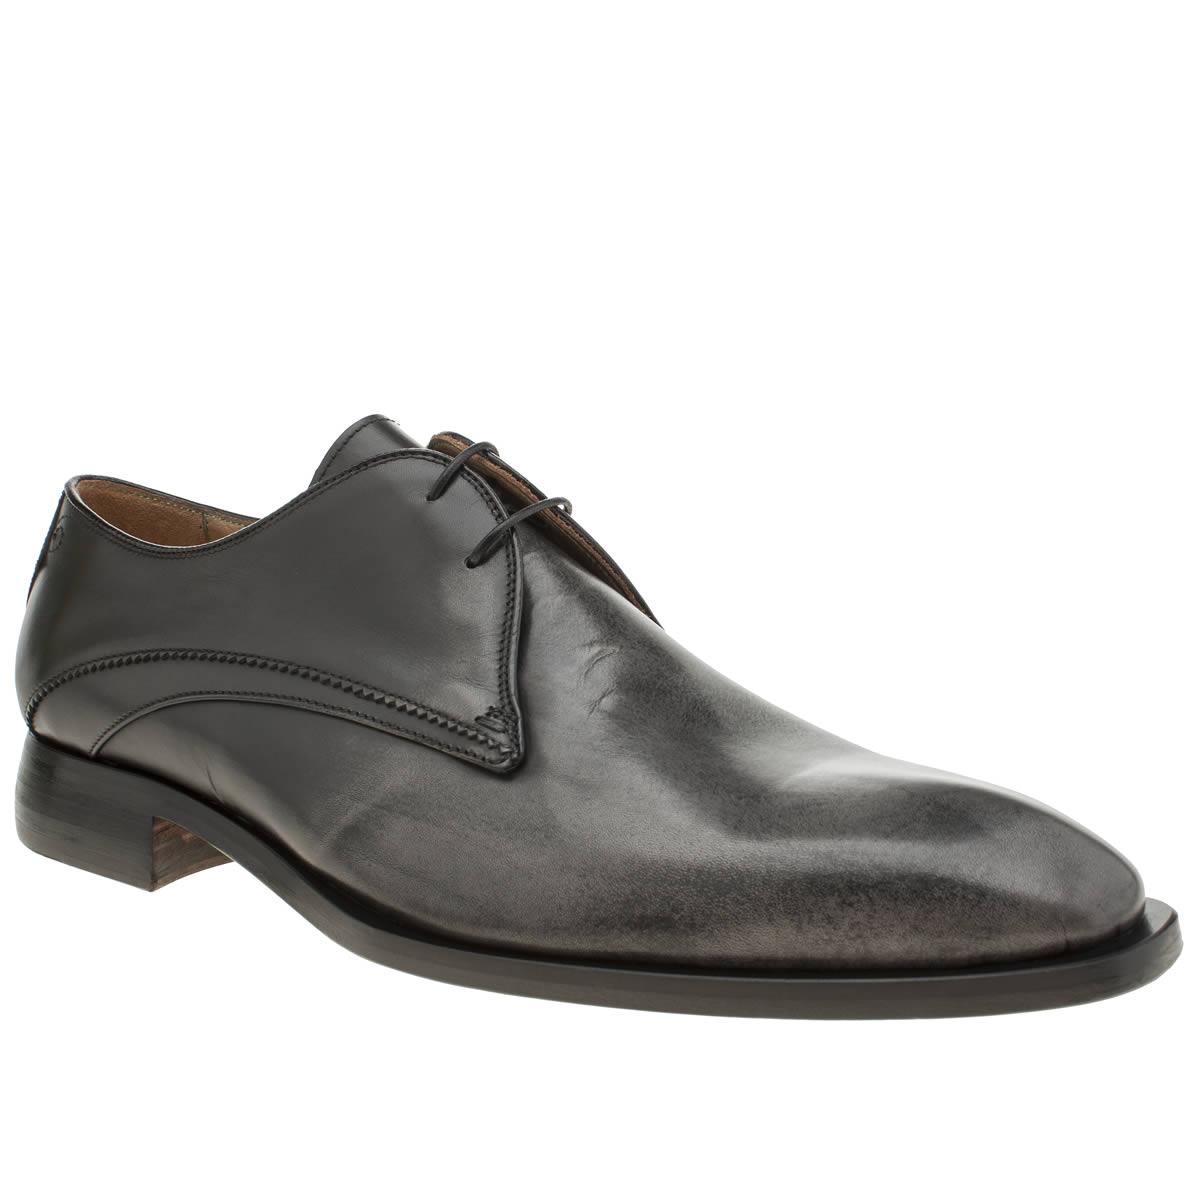 Oliver Sweeney Oliver Sweeney Black Deliceto Shoes